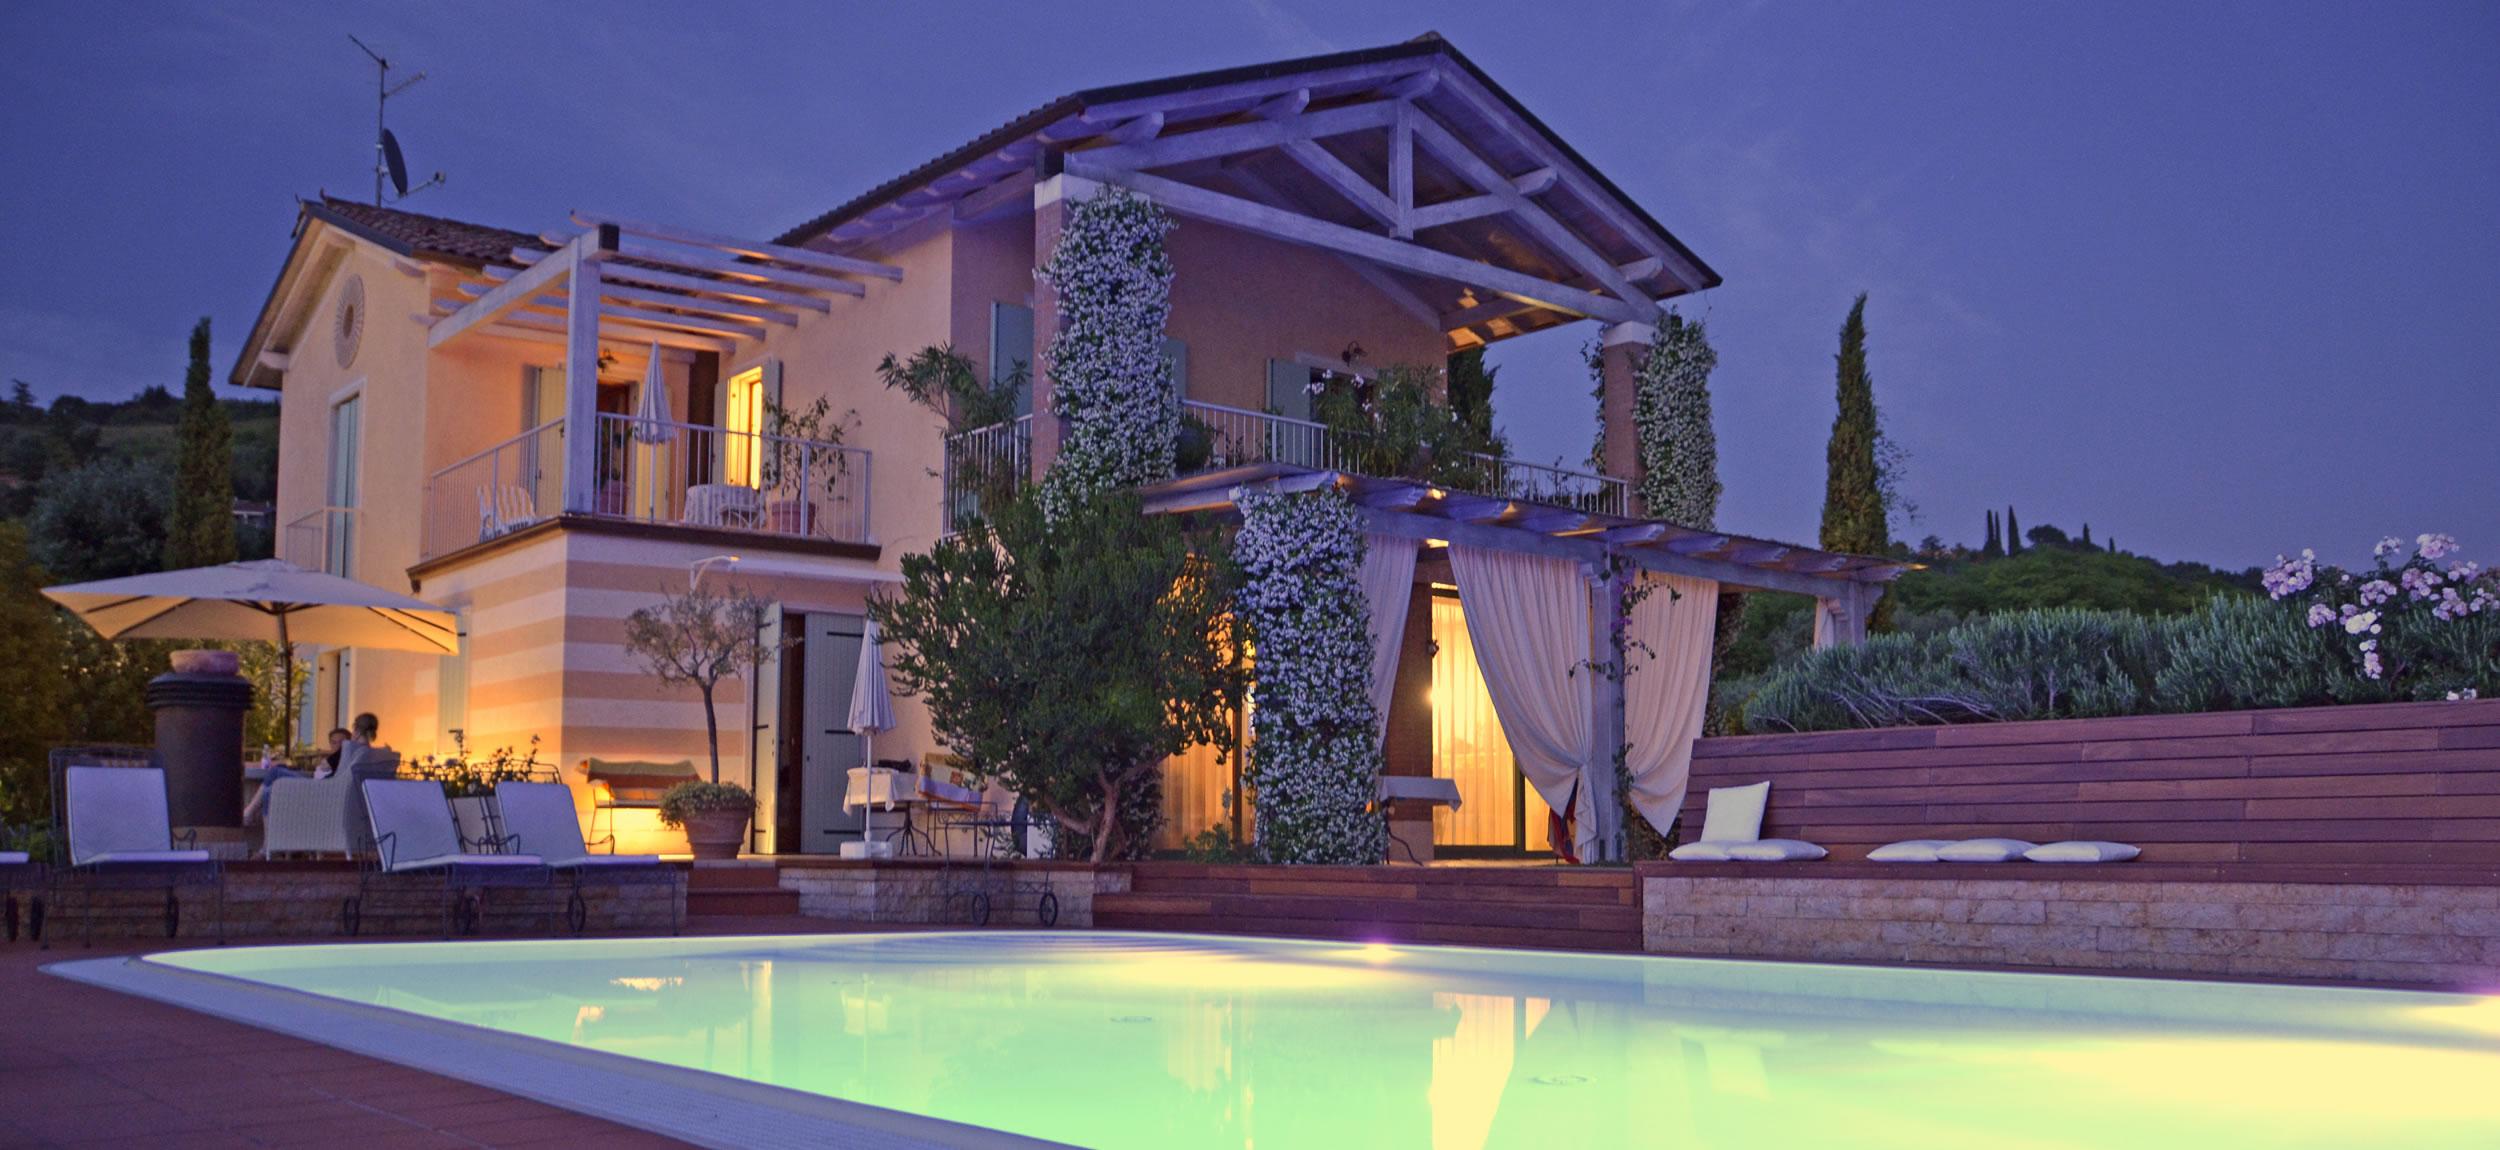 Bed and breakfast agriturismo a bardolino lago di garda - Hotel con piscina verona ...